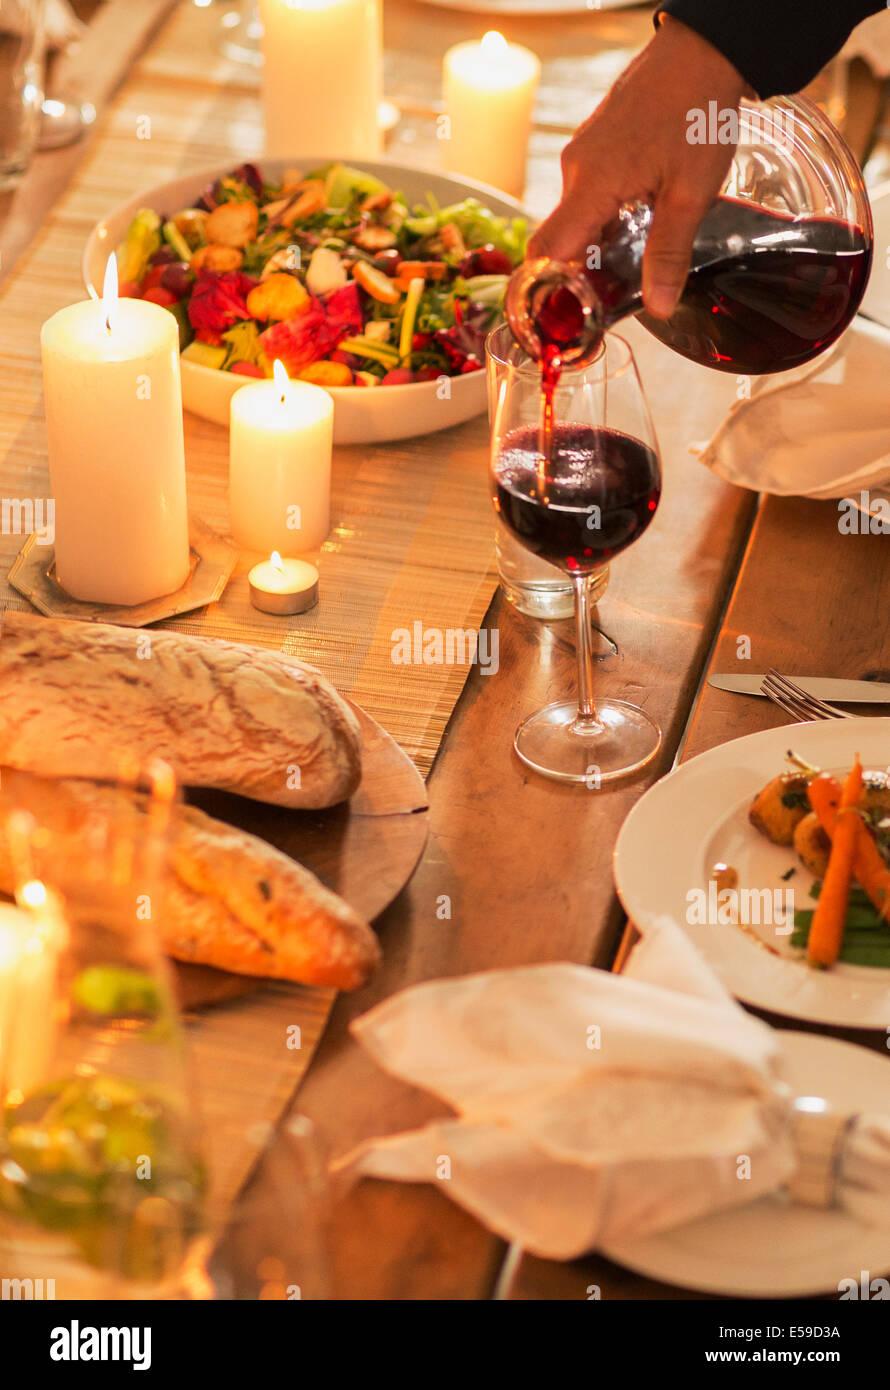 Frau gießt Wein bei Dinner-party Stockbild